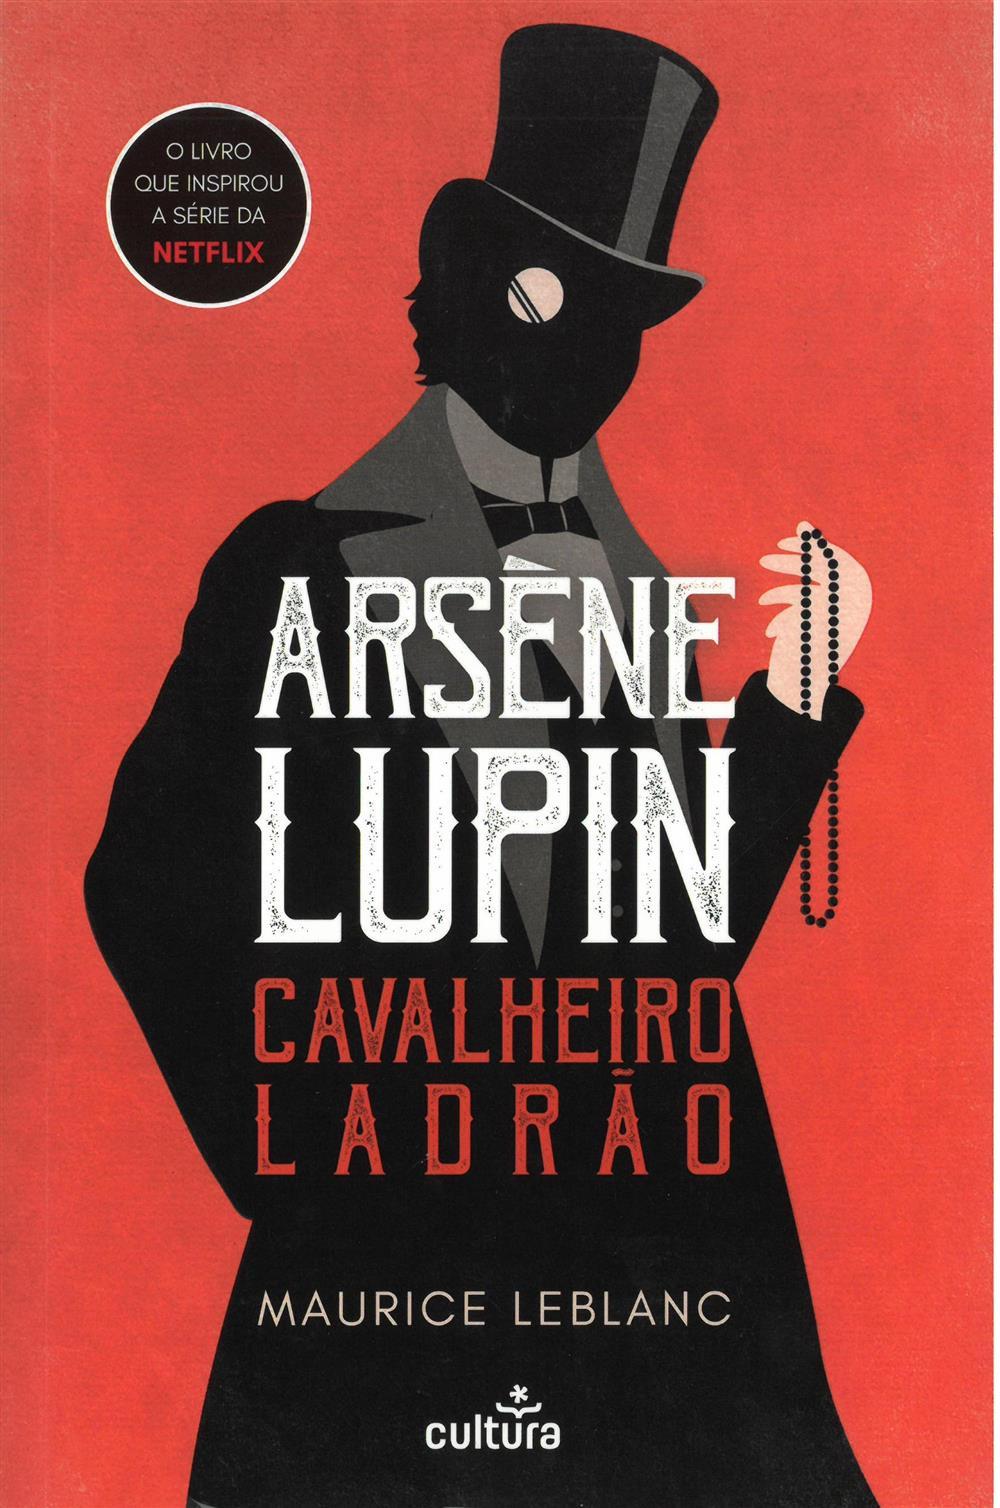 LEBLANC, Maurice (2021). Arsène Lupin : cavalheiro ladrão.jpg